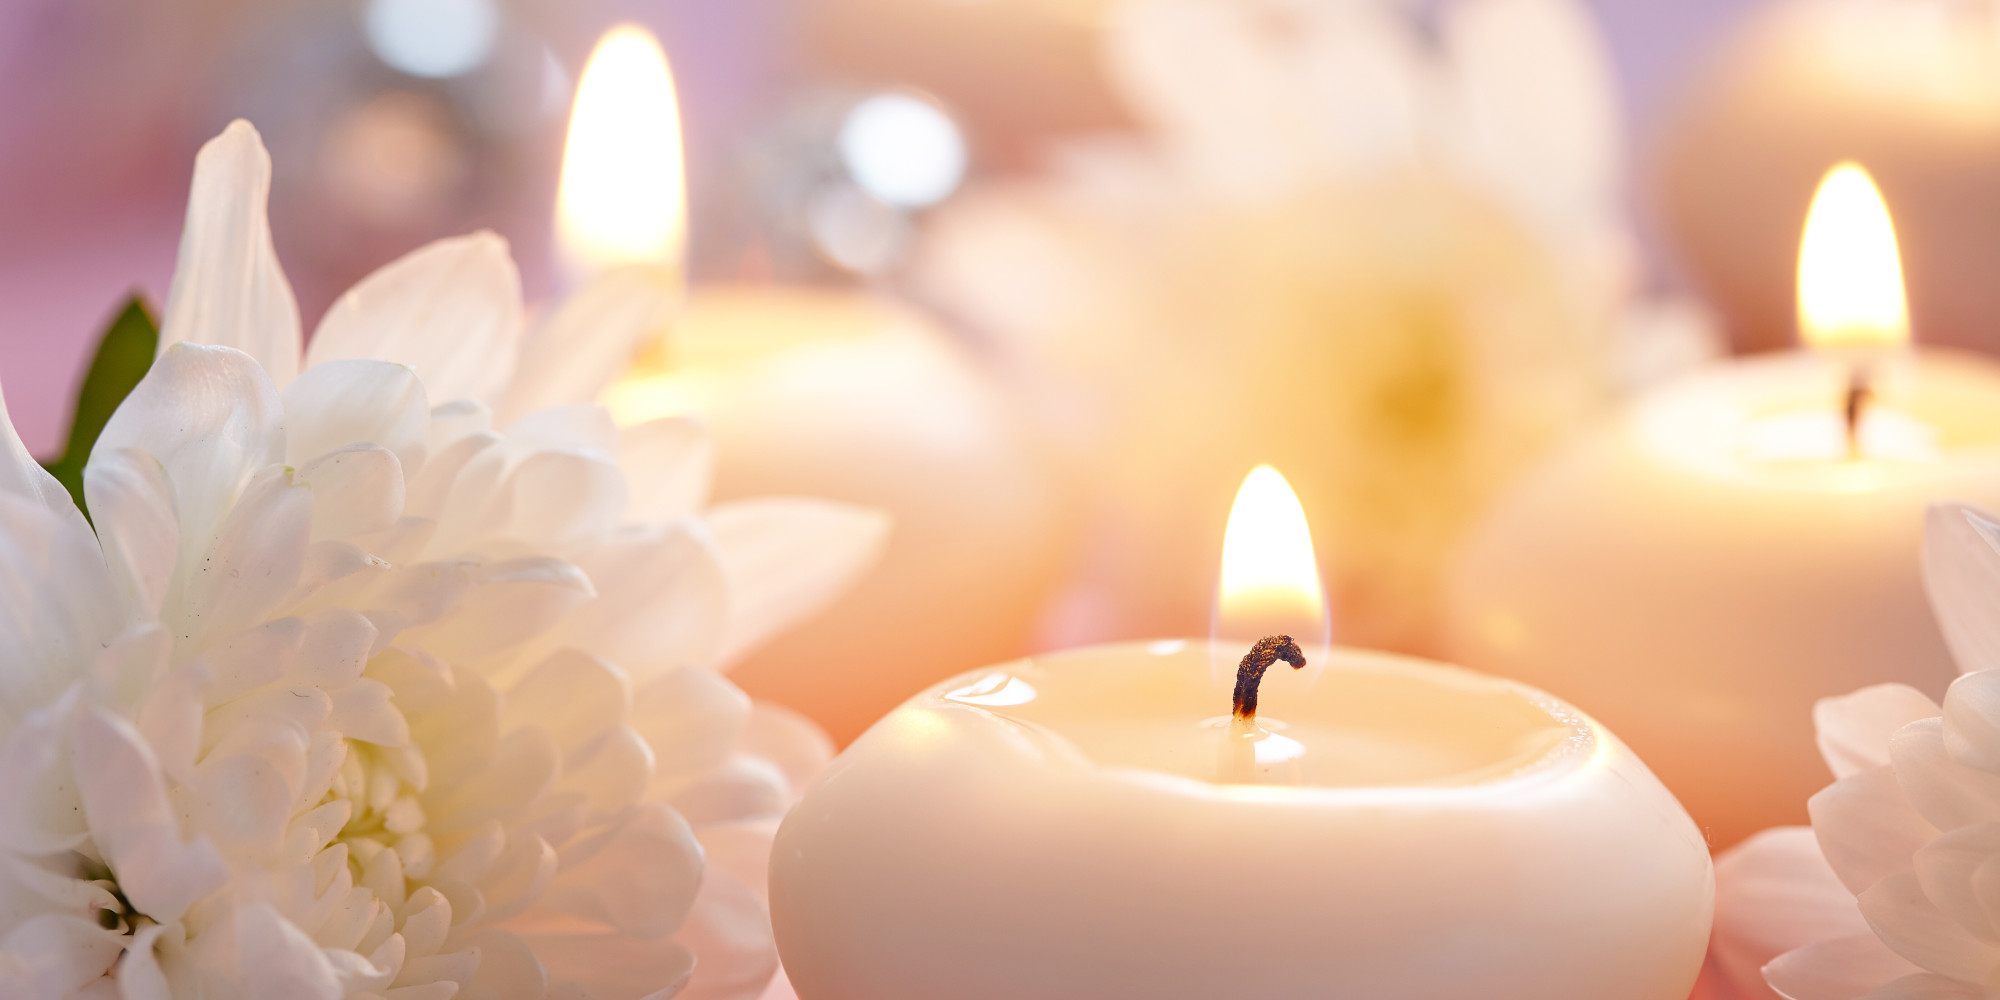 candles зурган илэрцүүд